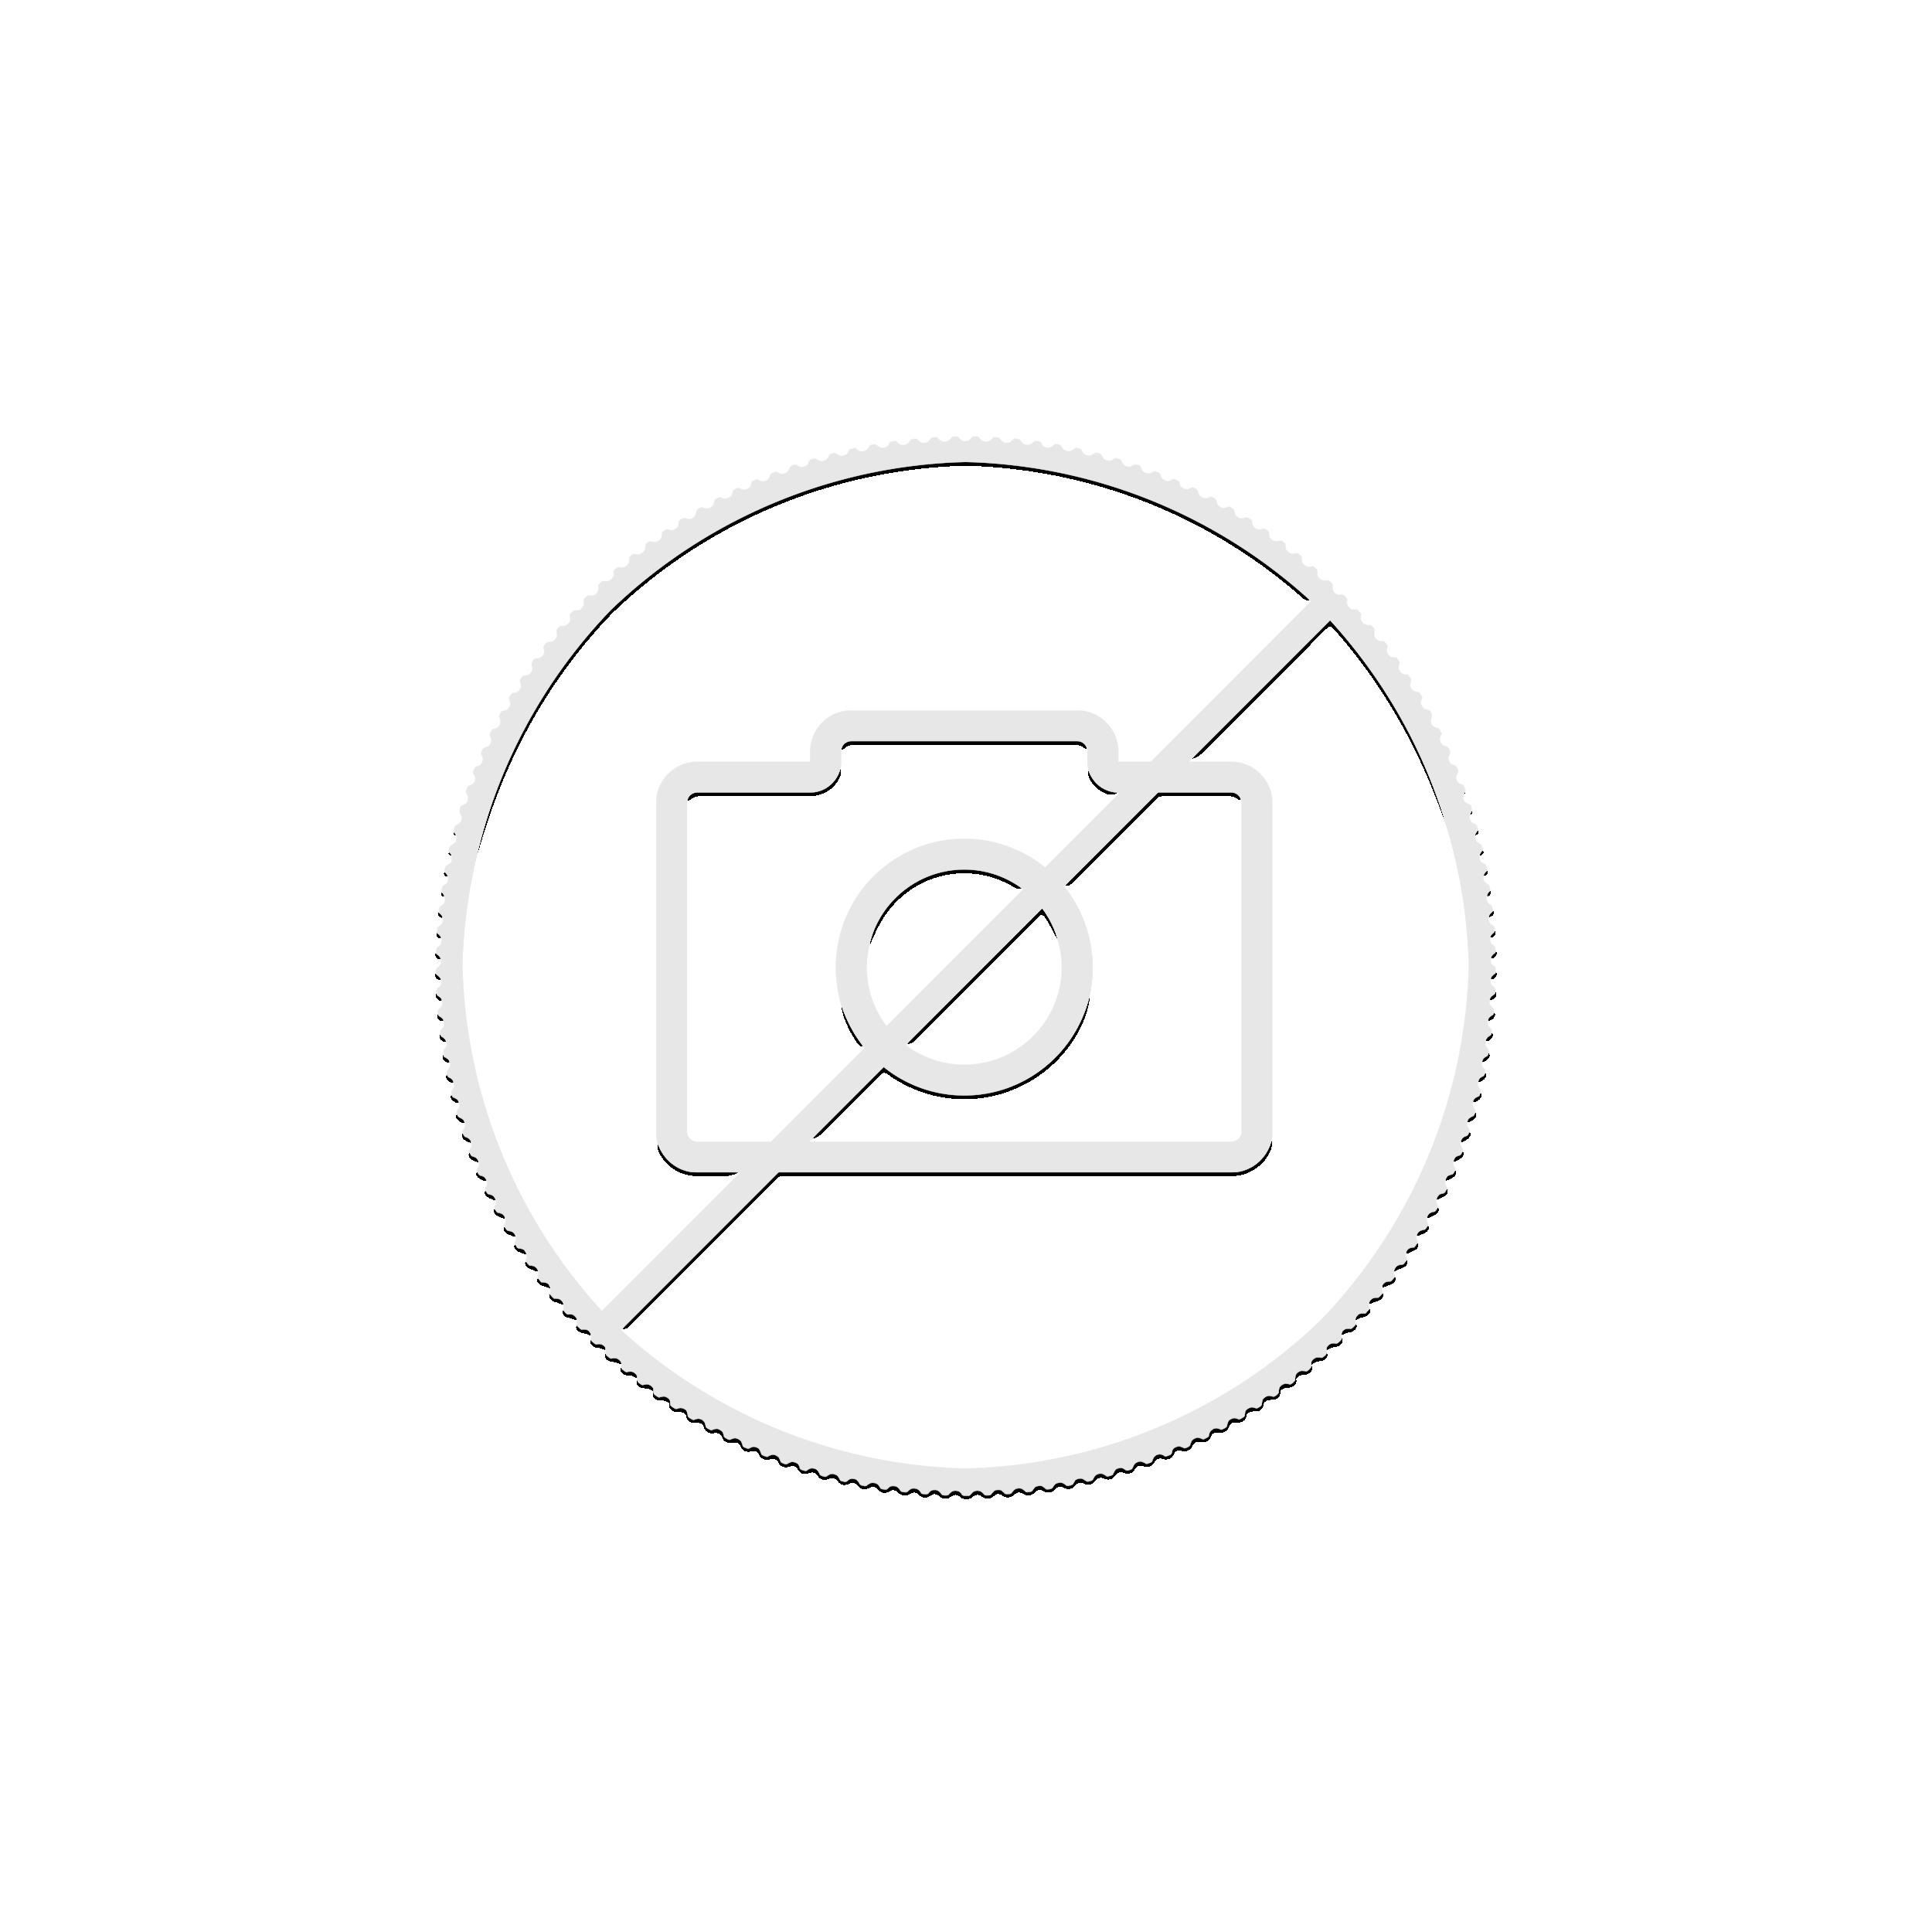 1/10 troy ounce gold coin Krugerrand 2021